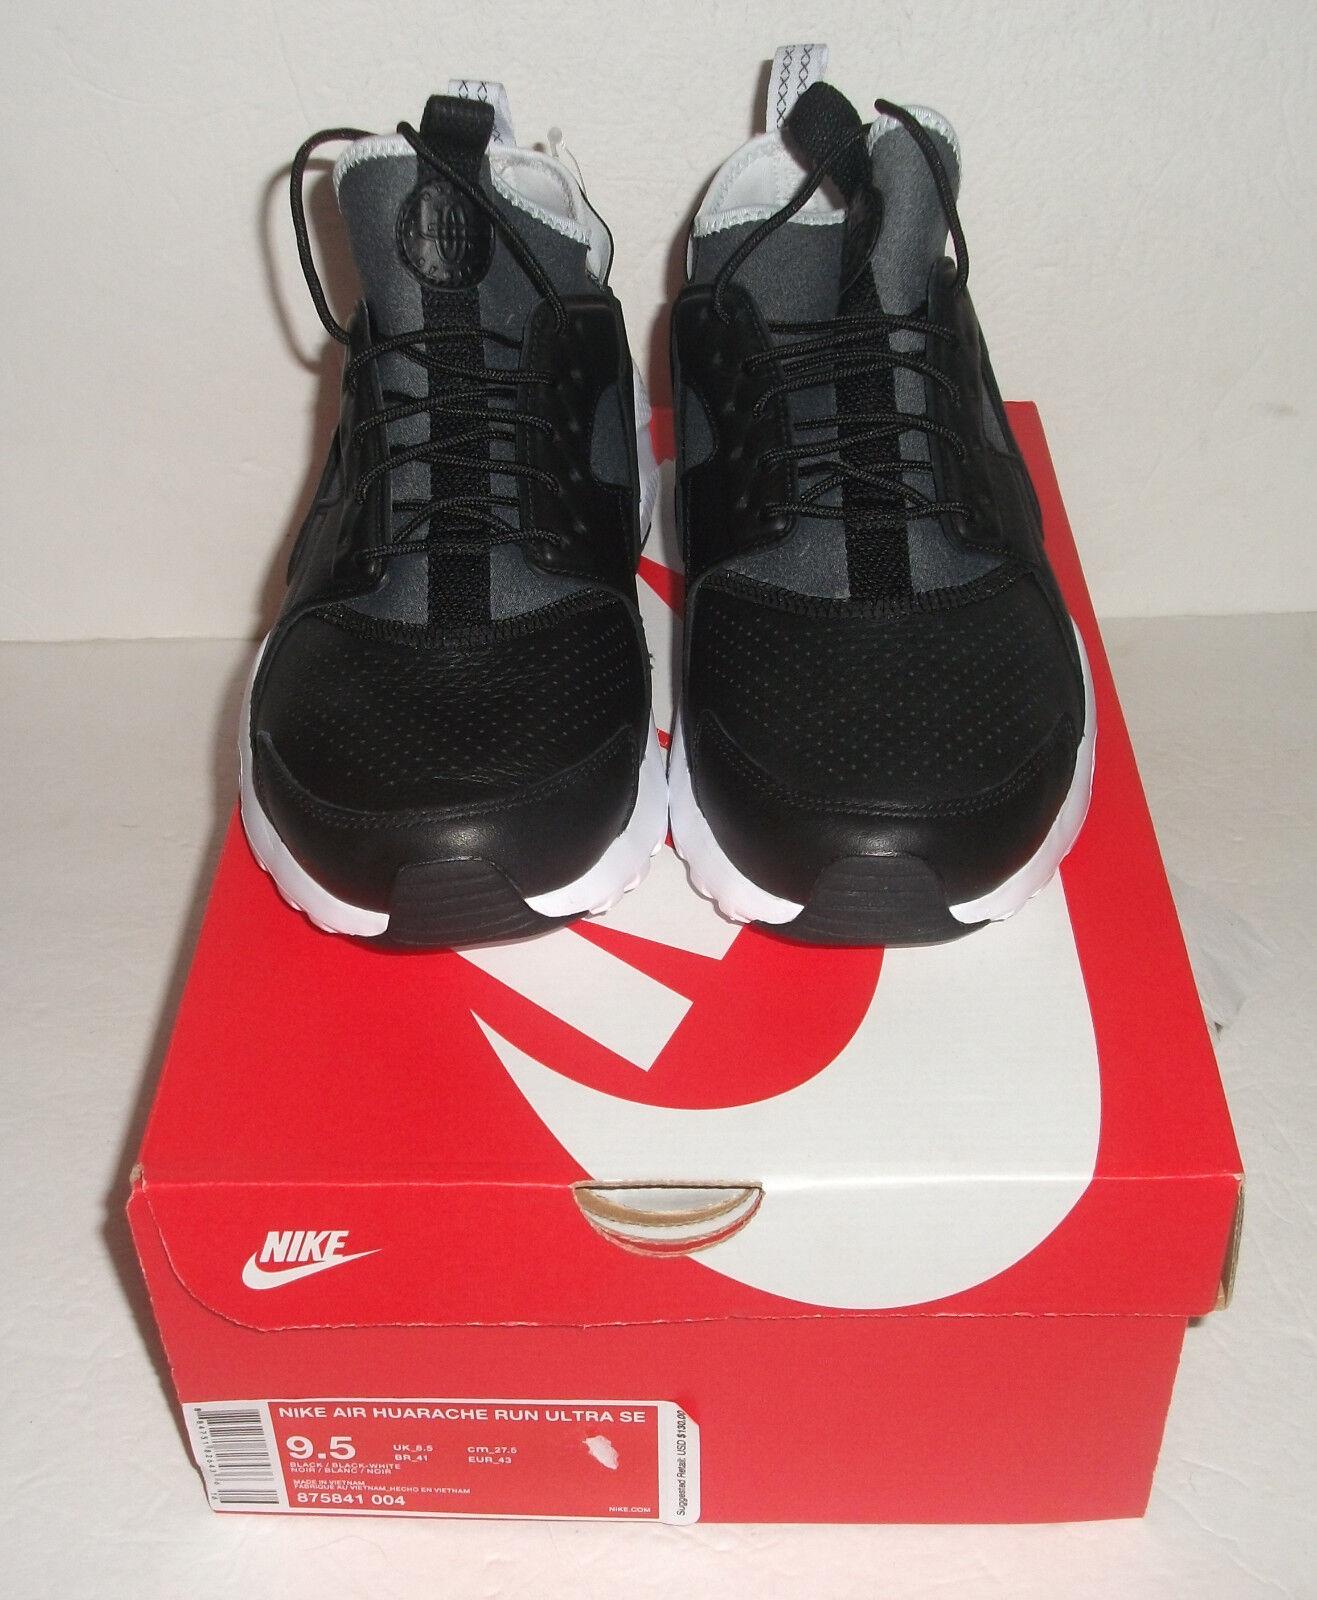 New Nike Air Huarache Run Ultra SE Running, Men's Size 9.5, Black, 875841 004